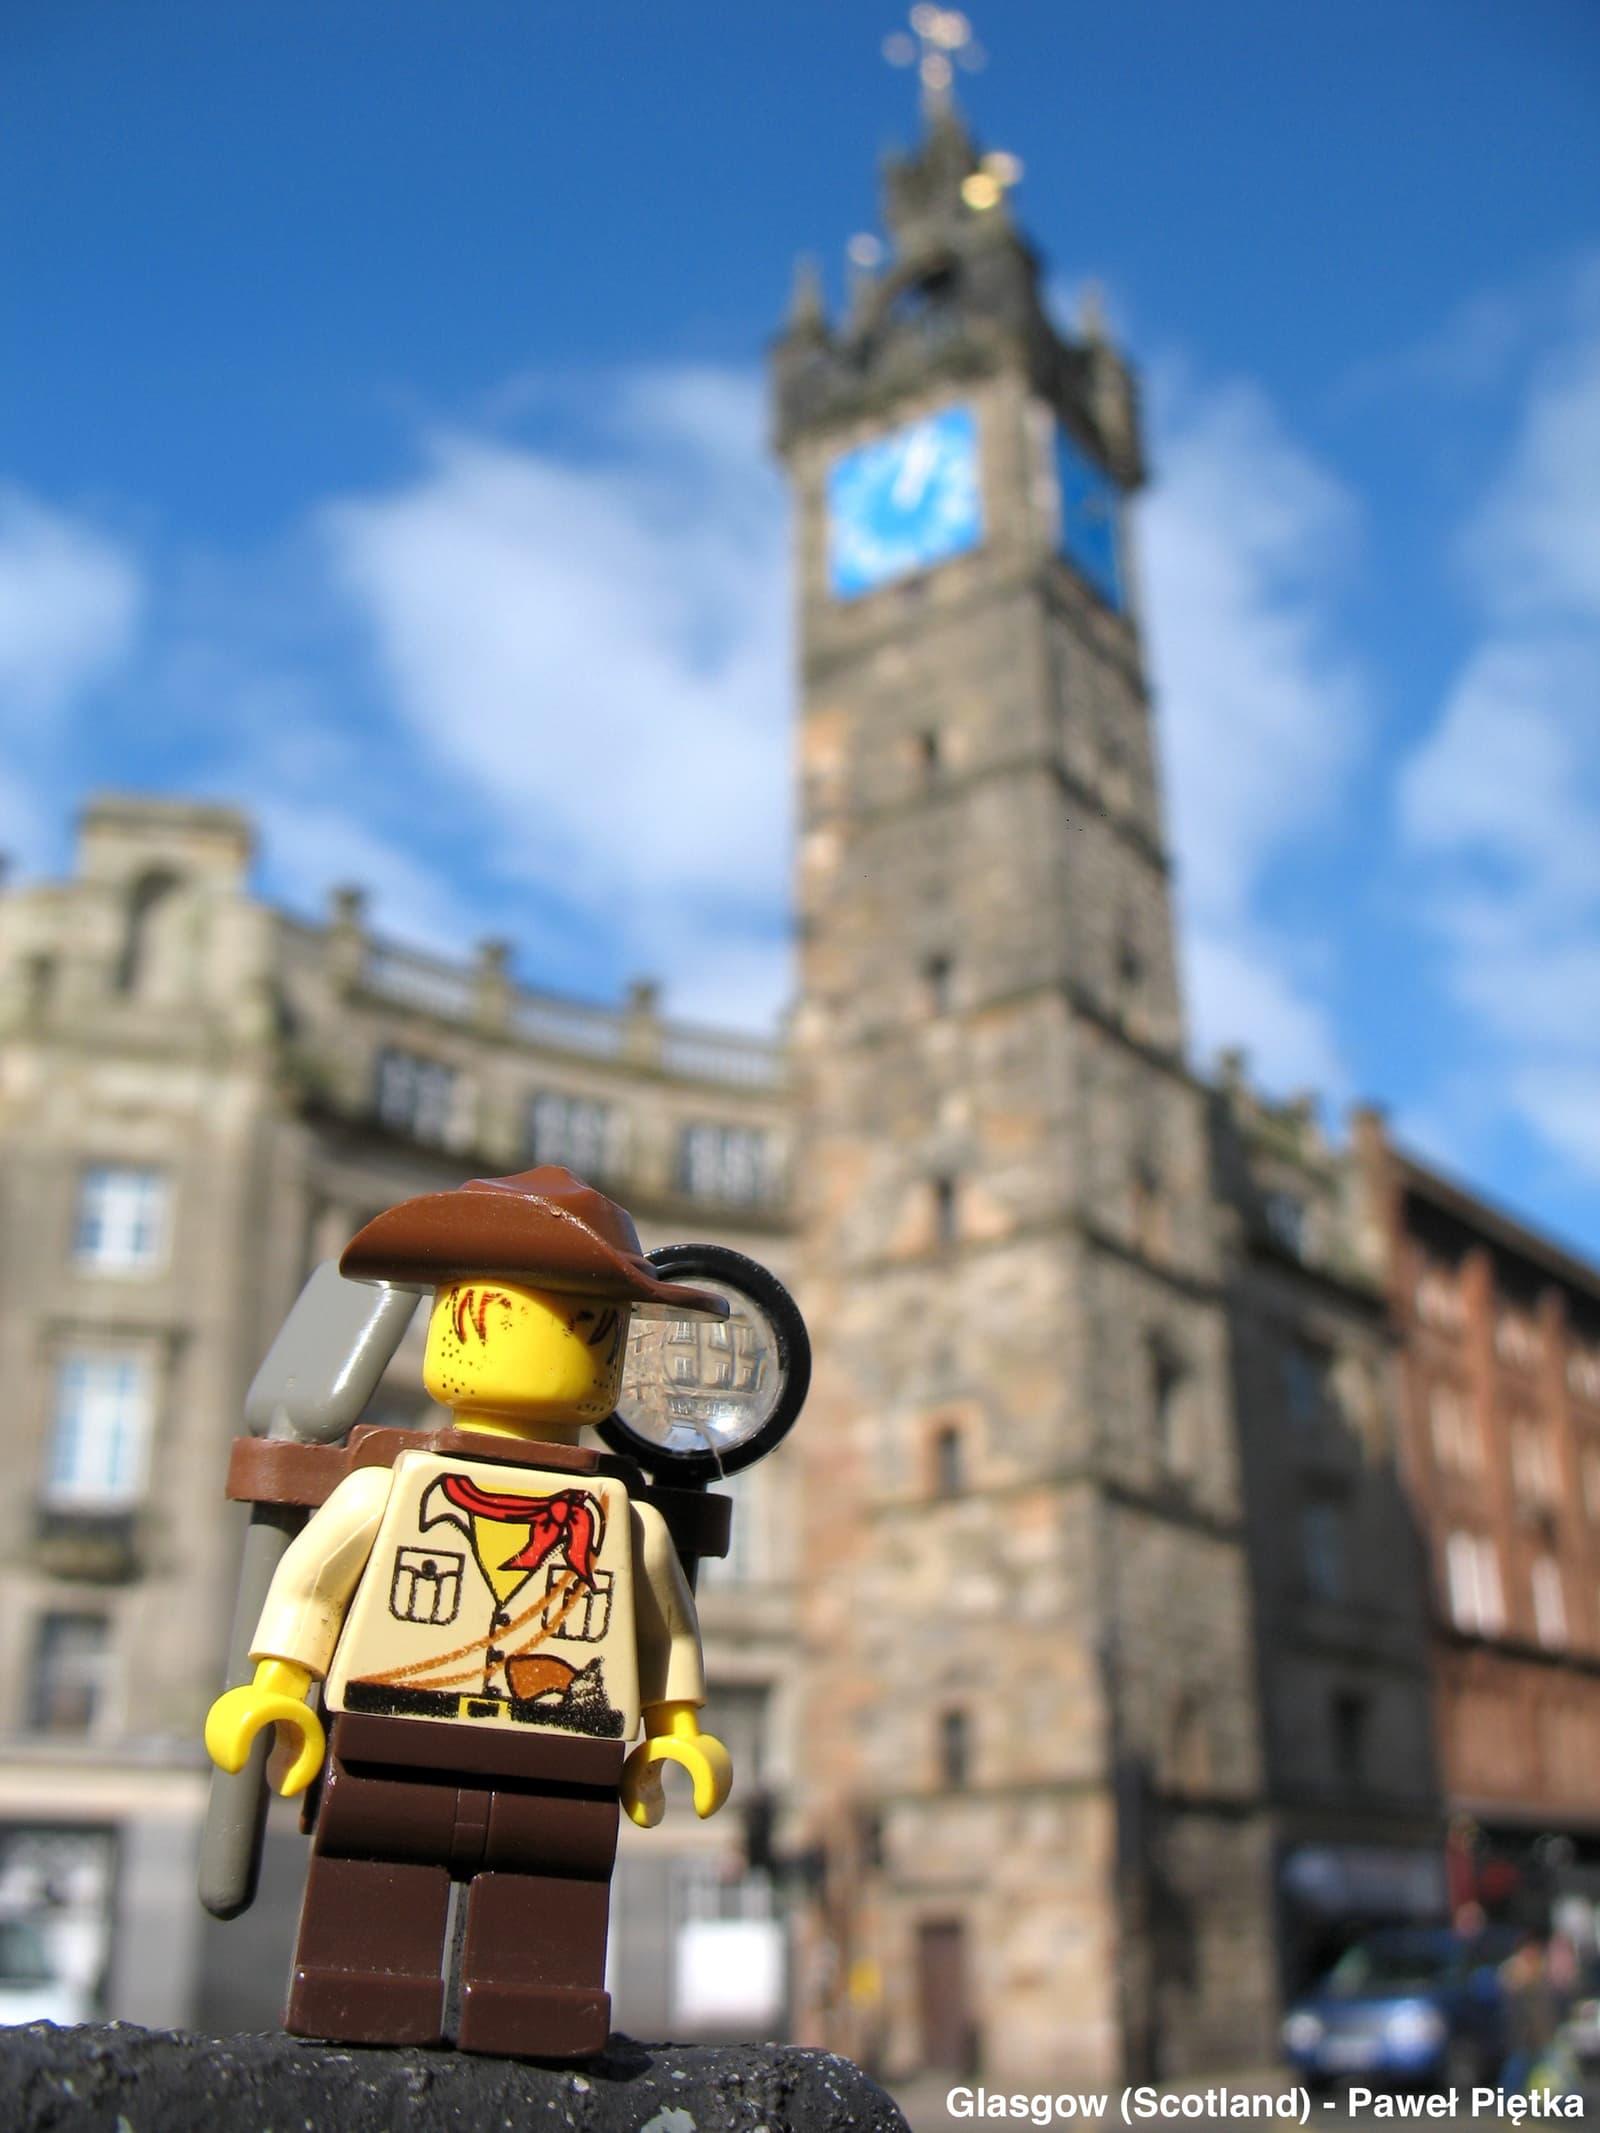 Glasgow (Scotland) - Tolbooth Steeple